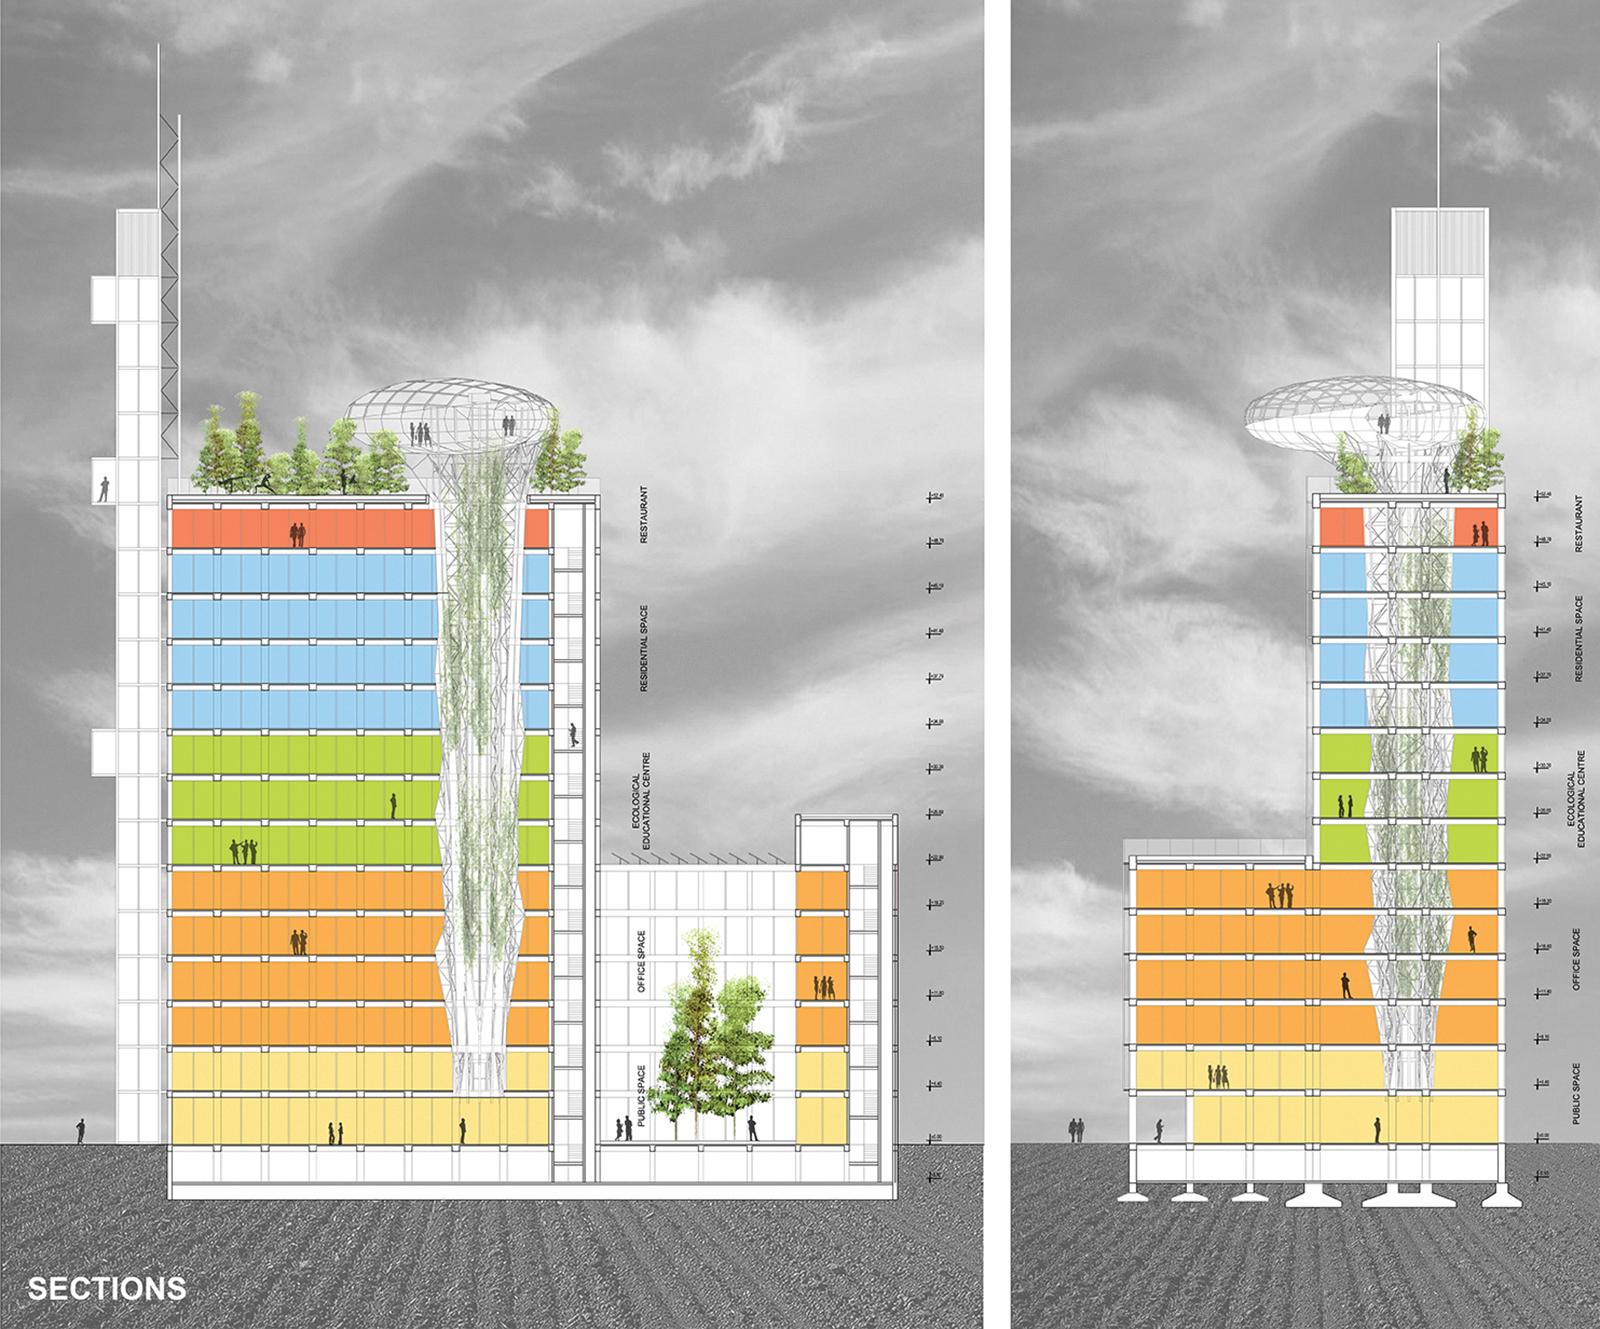 D:Arhitektura4_konkursi18_Stattwerk_Zeleni venacCADFINALp